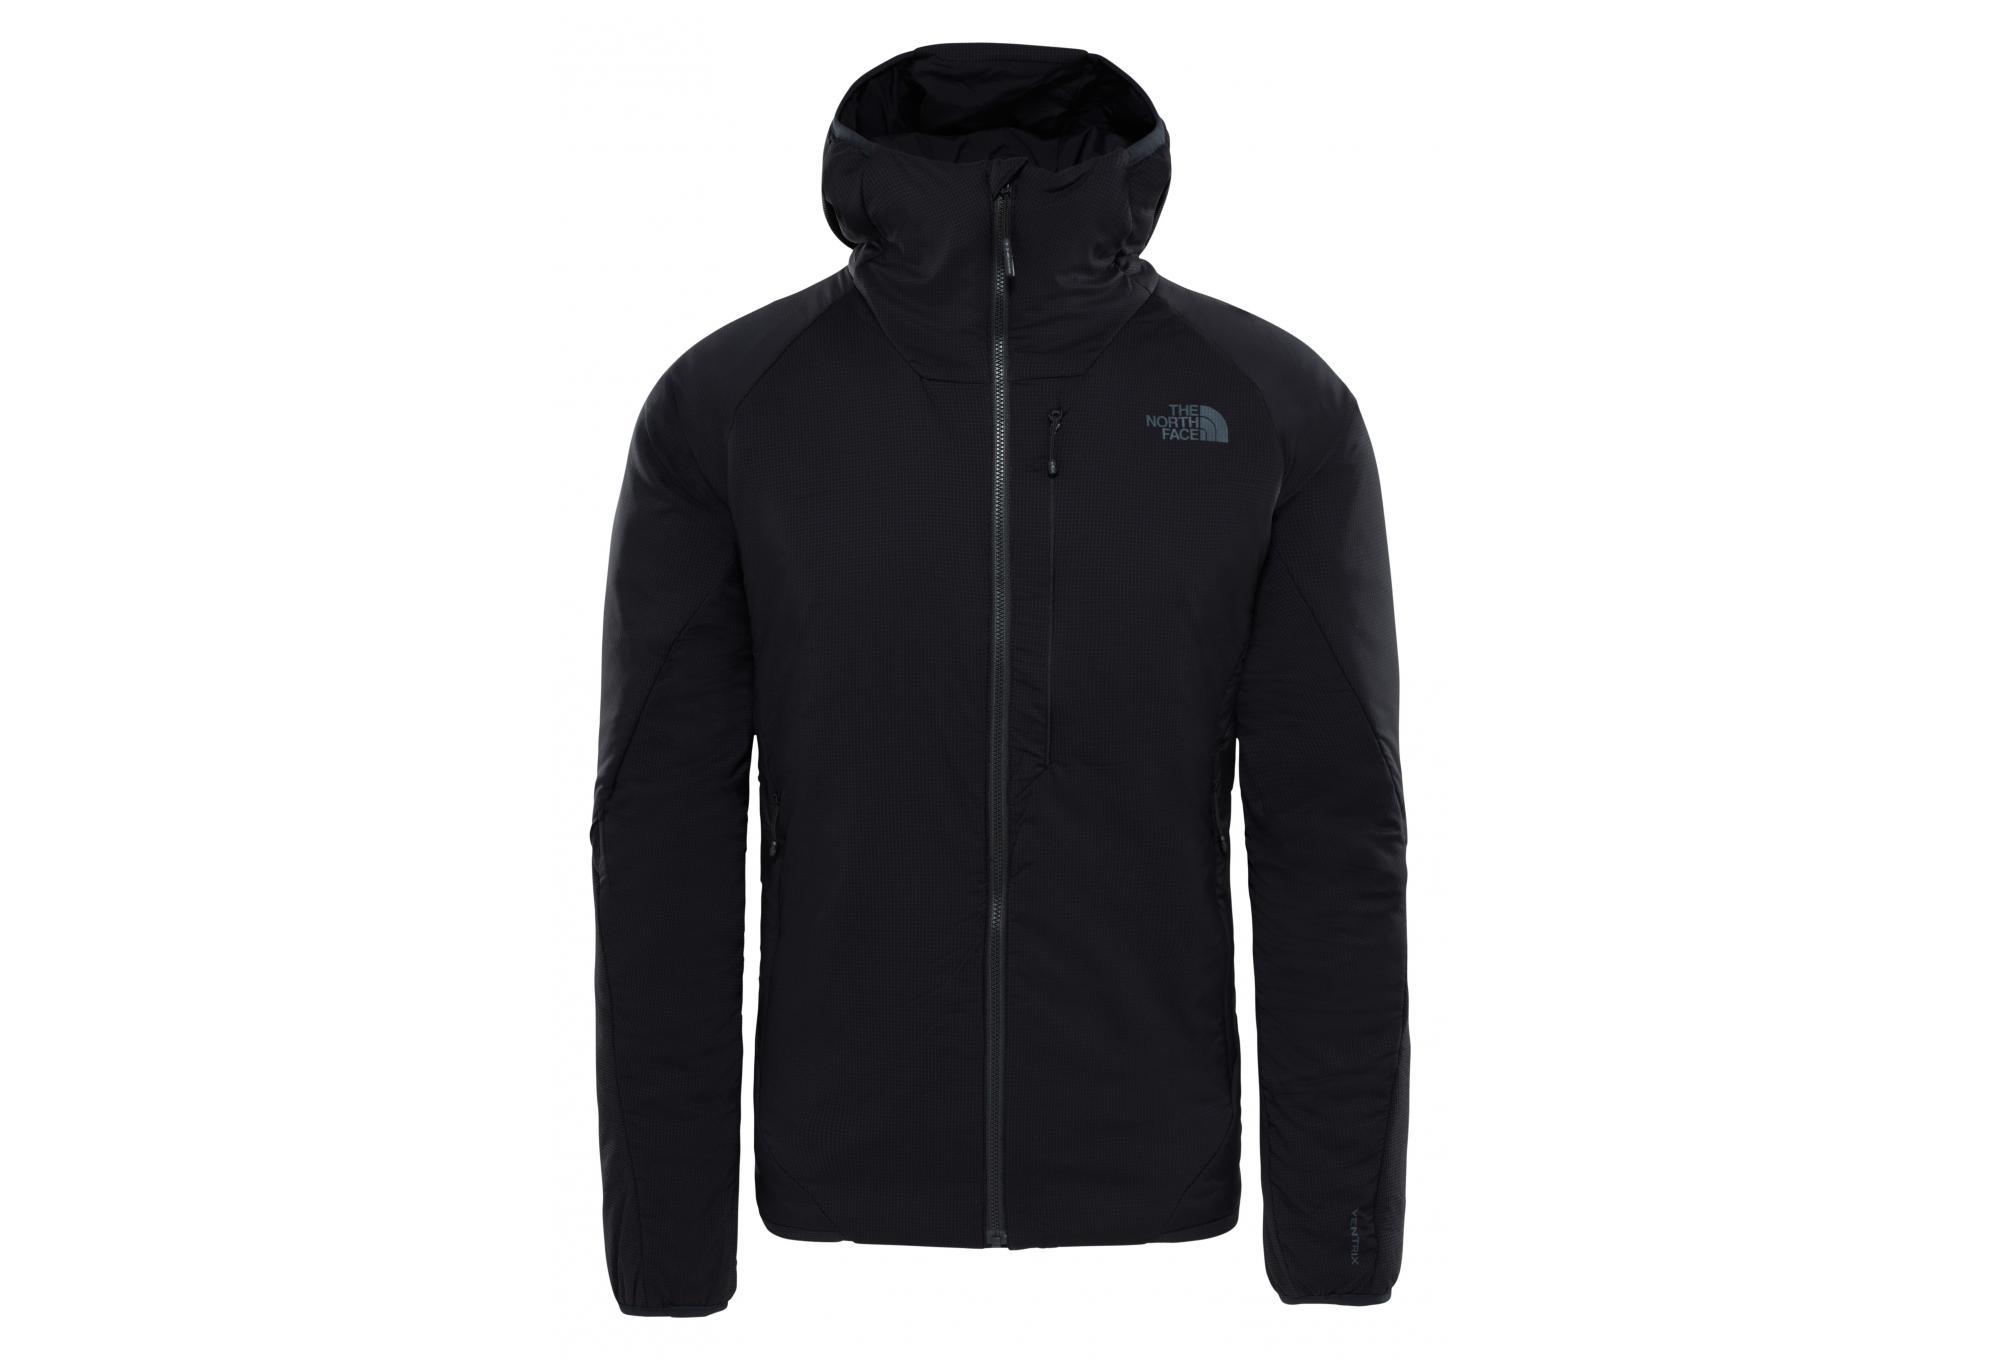 55115d7d16d5 The North Face Trevail Jacket Black